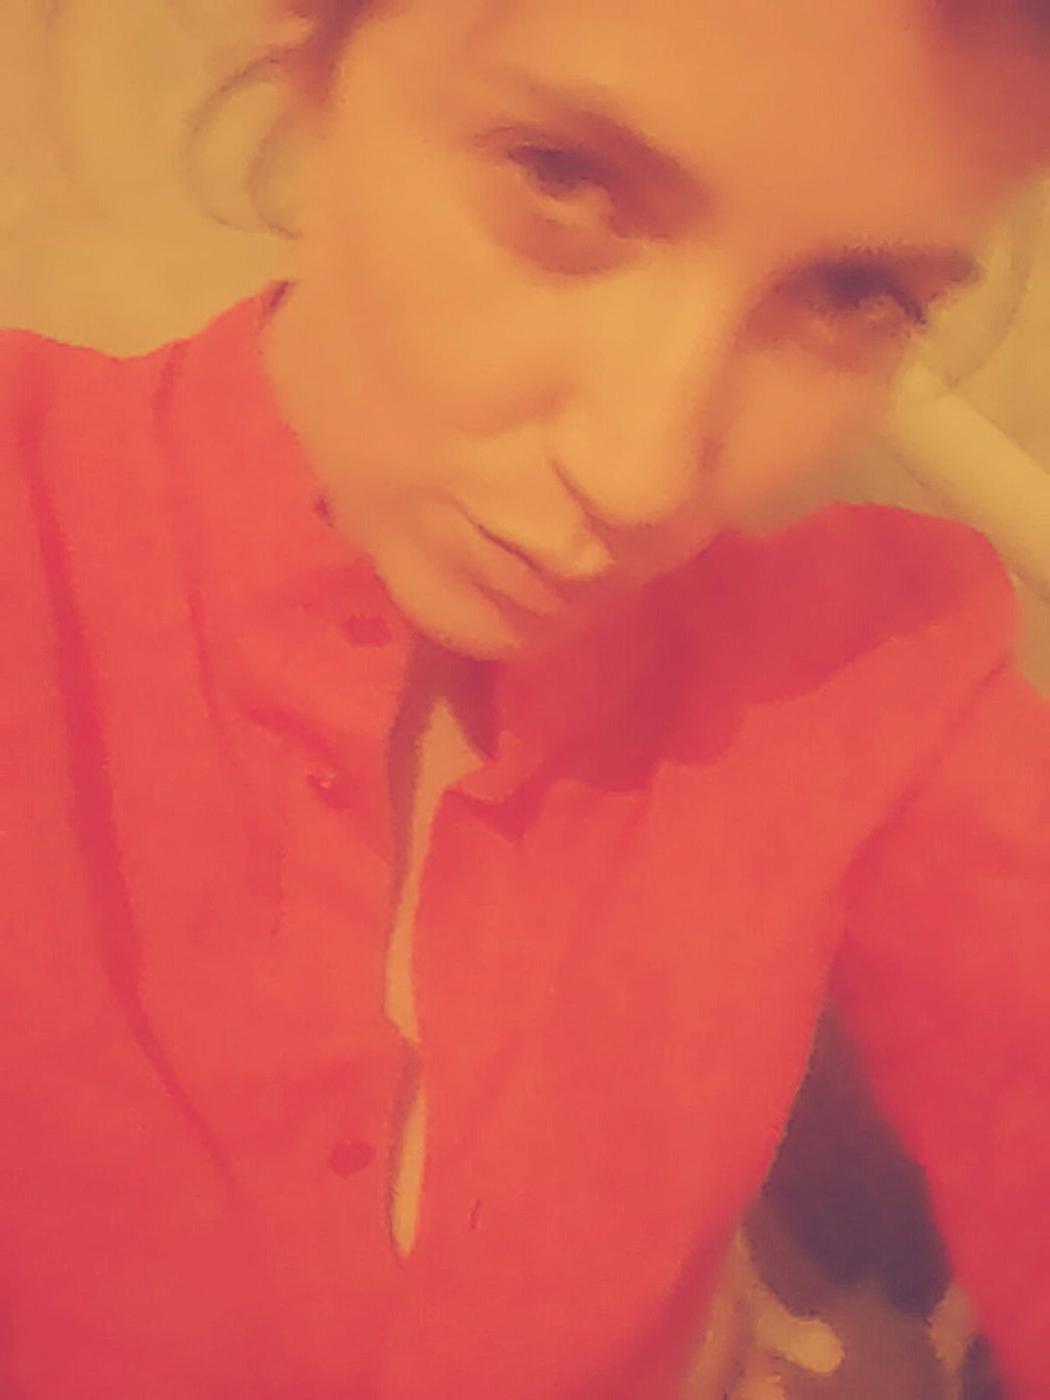 Проститутка МАМА, 24 года, метро Нагатинский затон